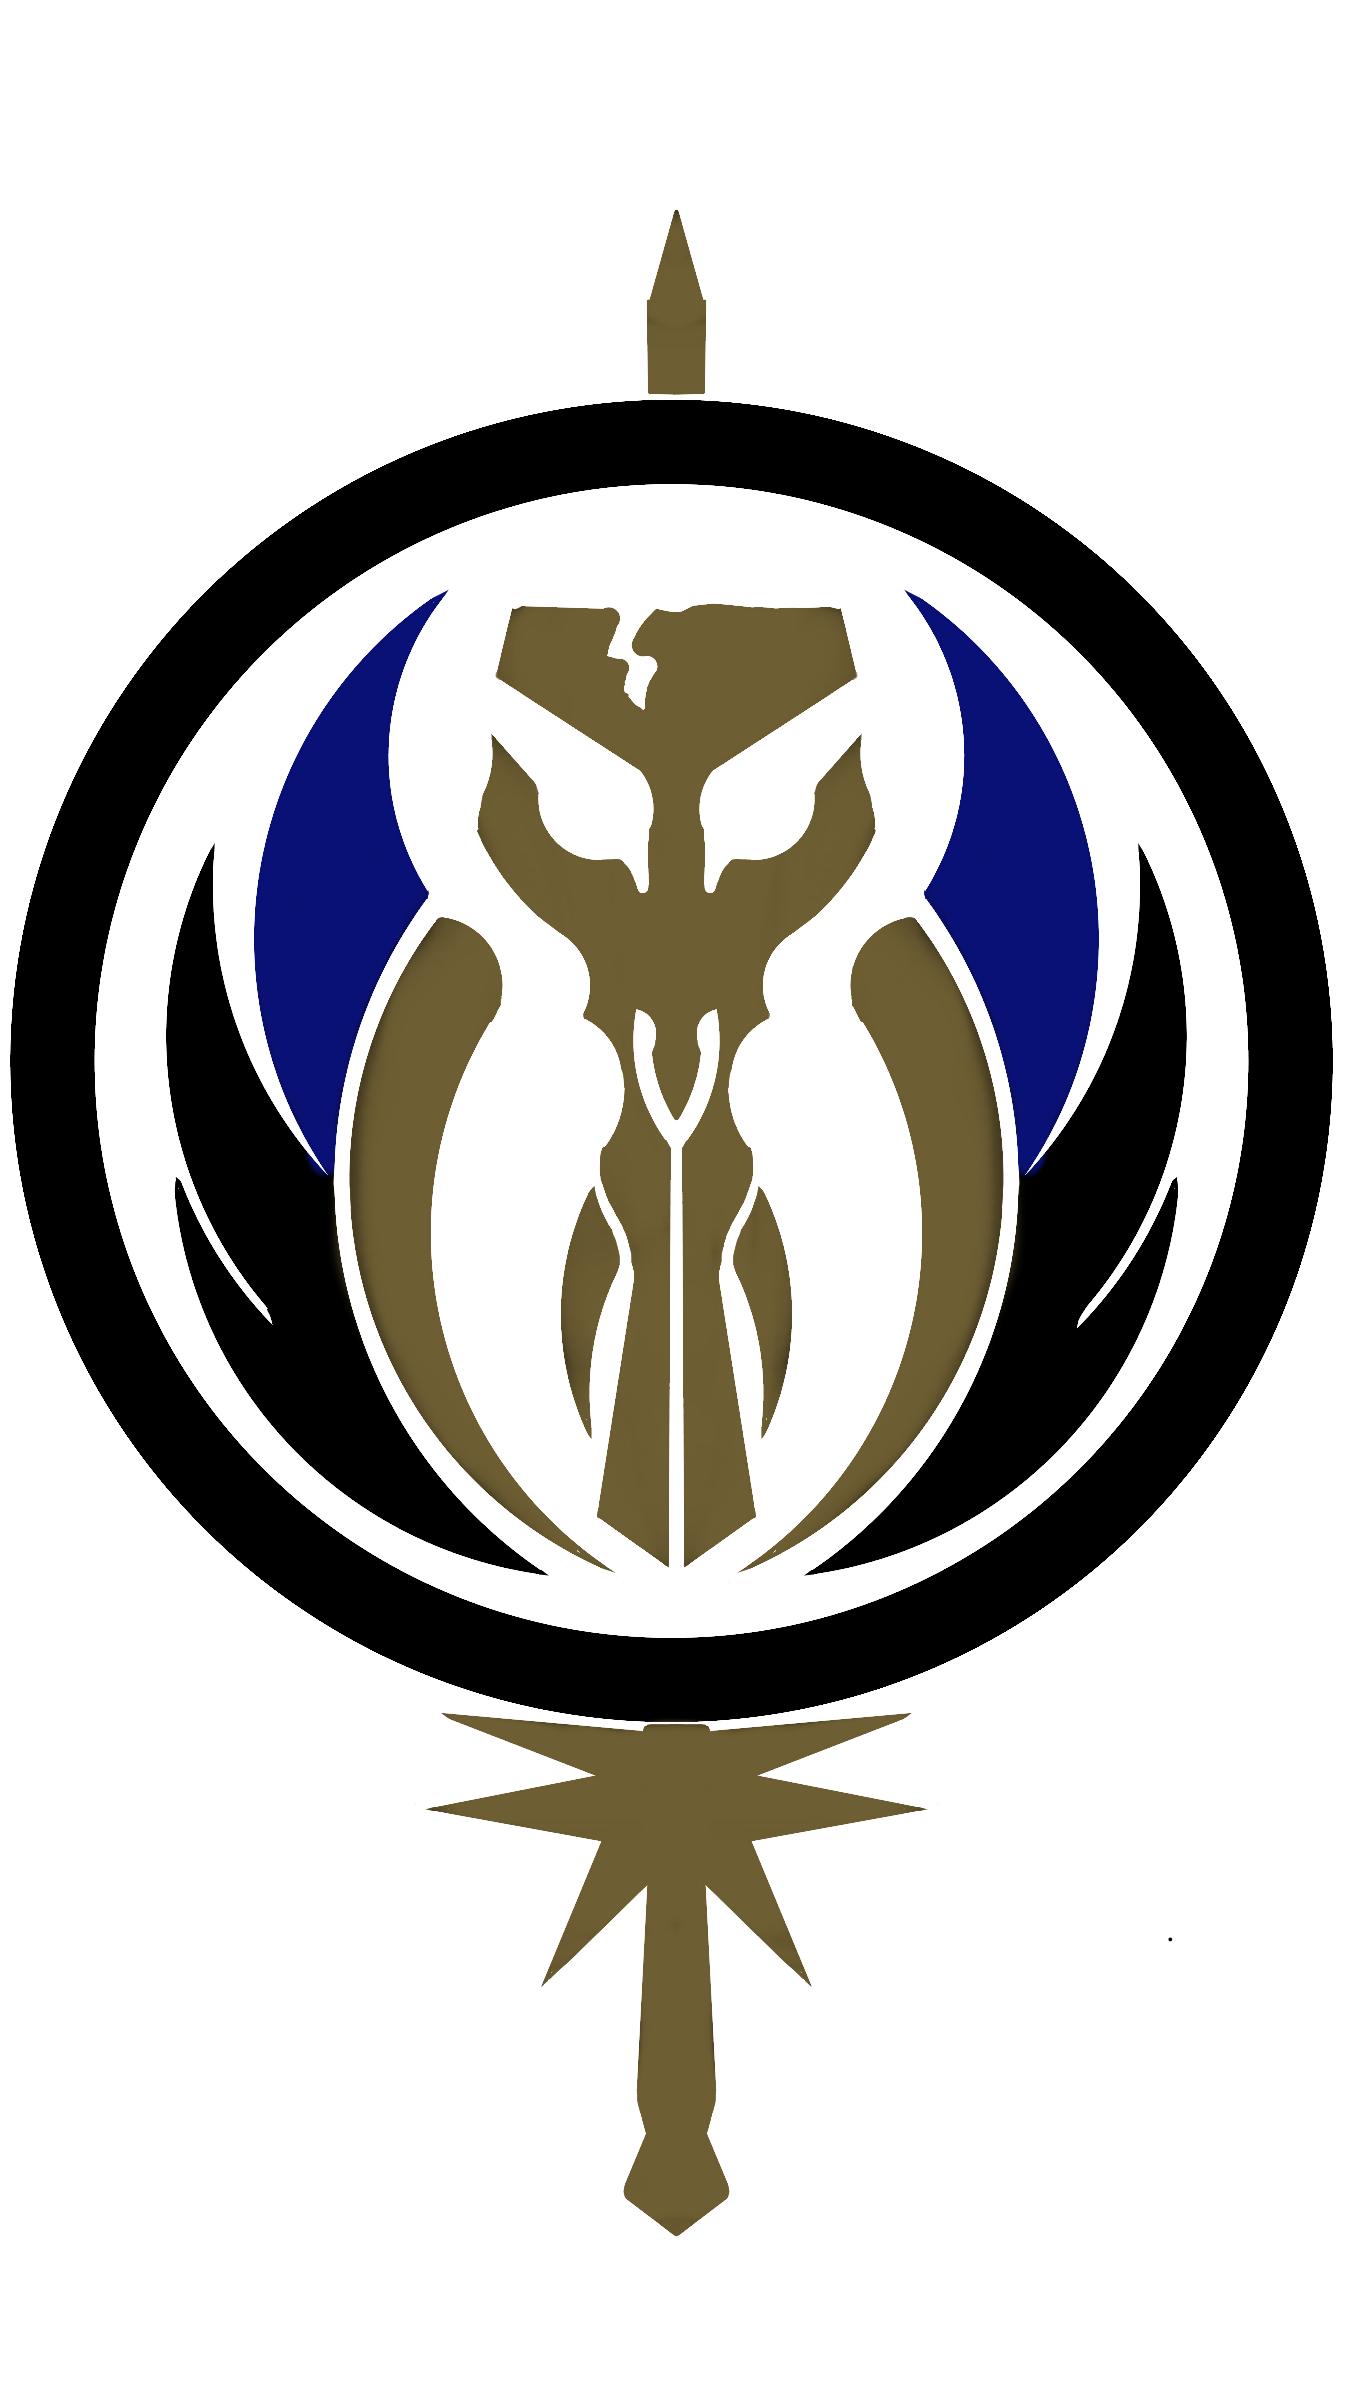 Mandalorian Jedi Insignia By AlexanderBlootbot On DeviantArt